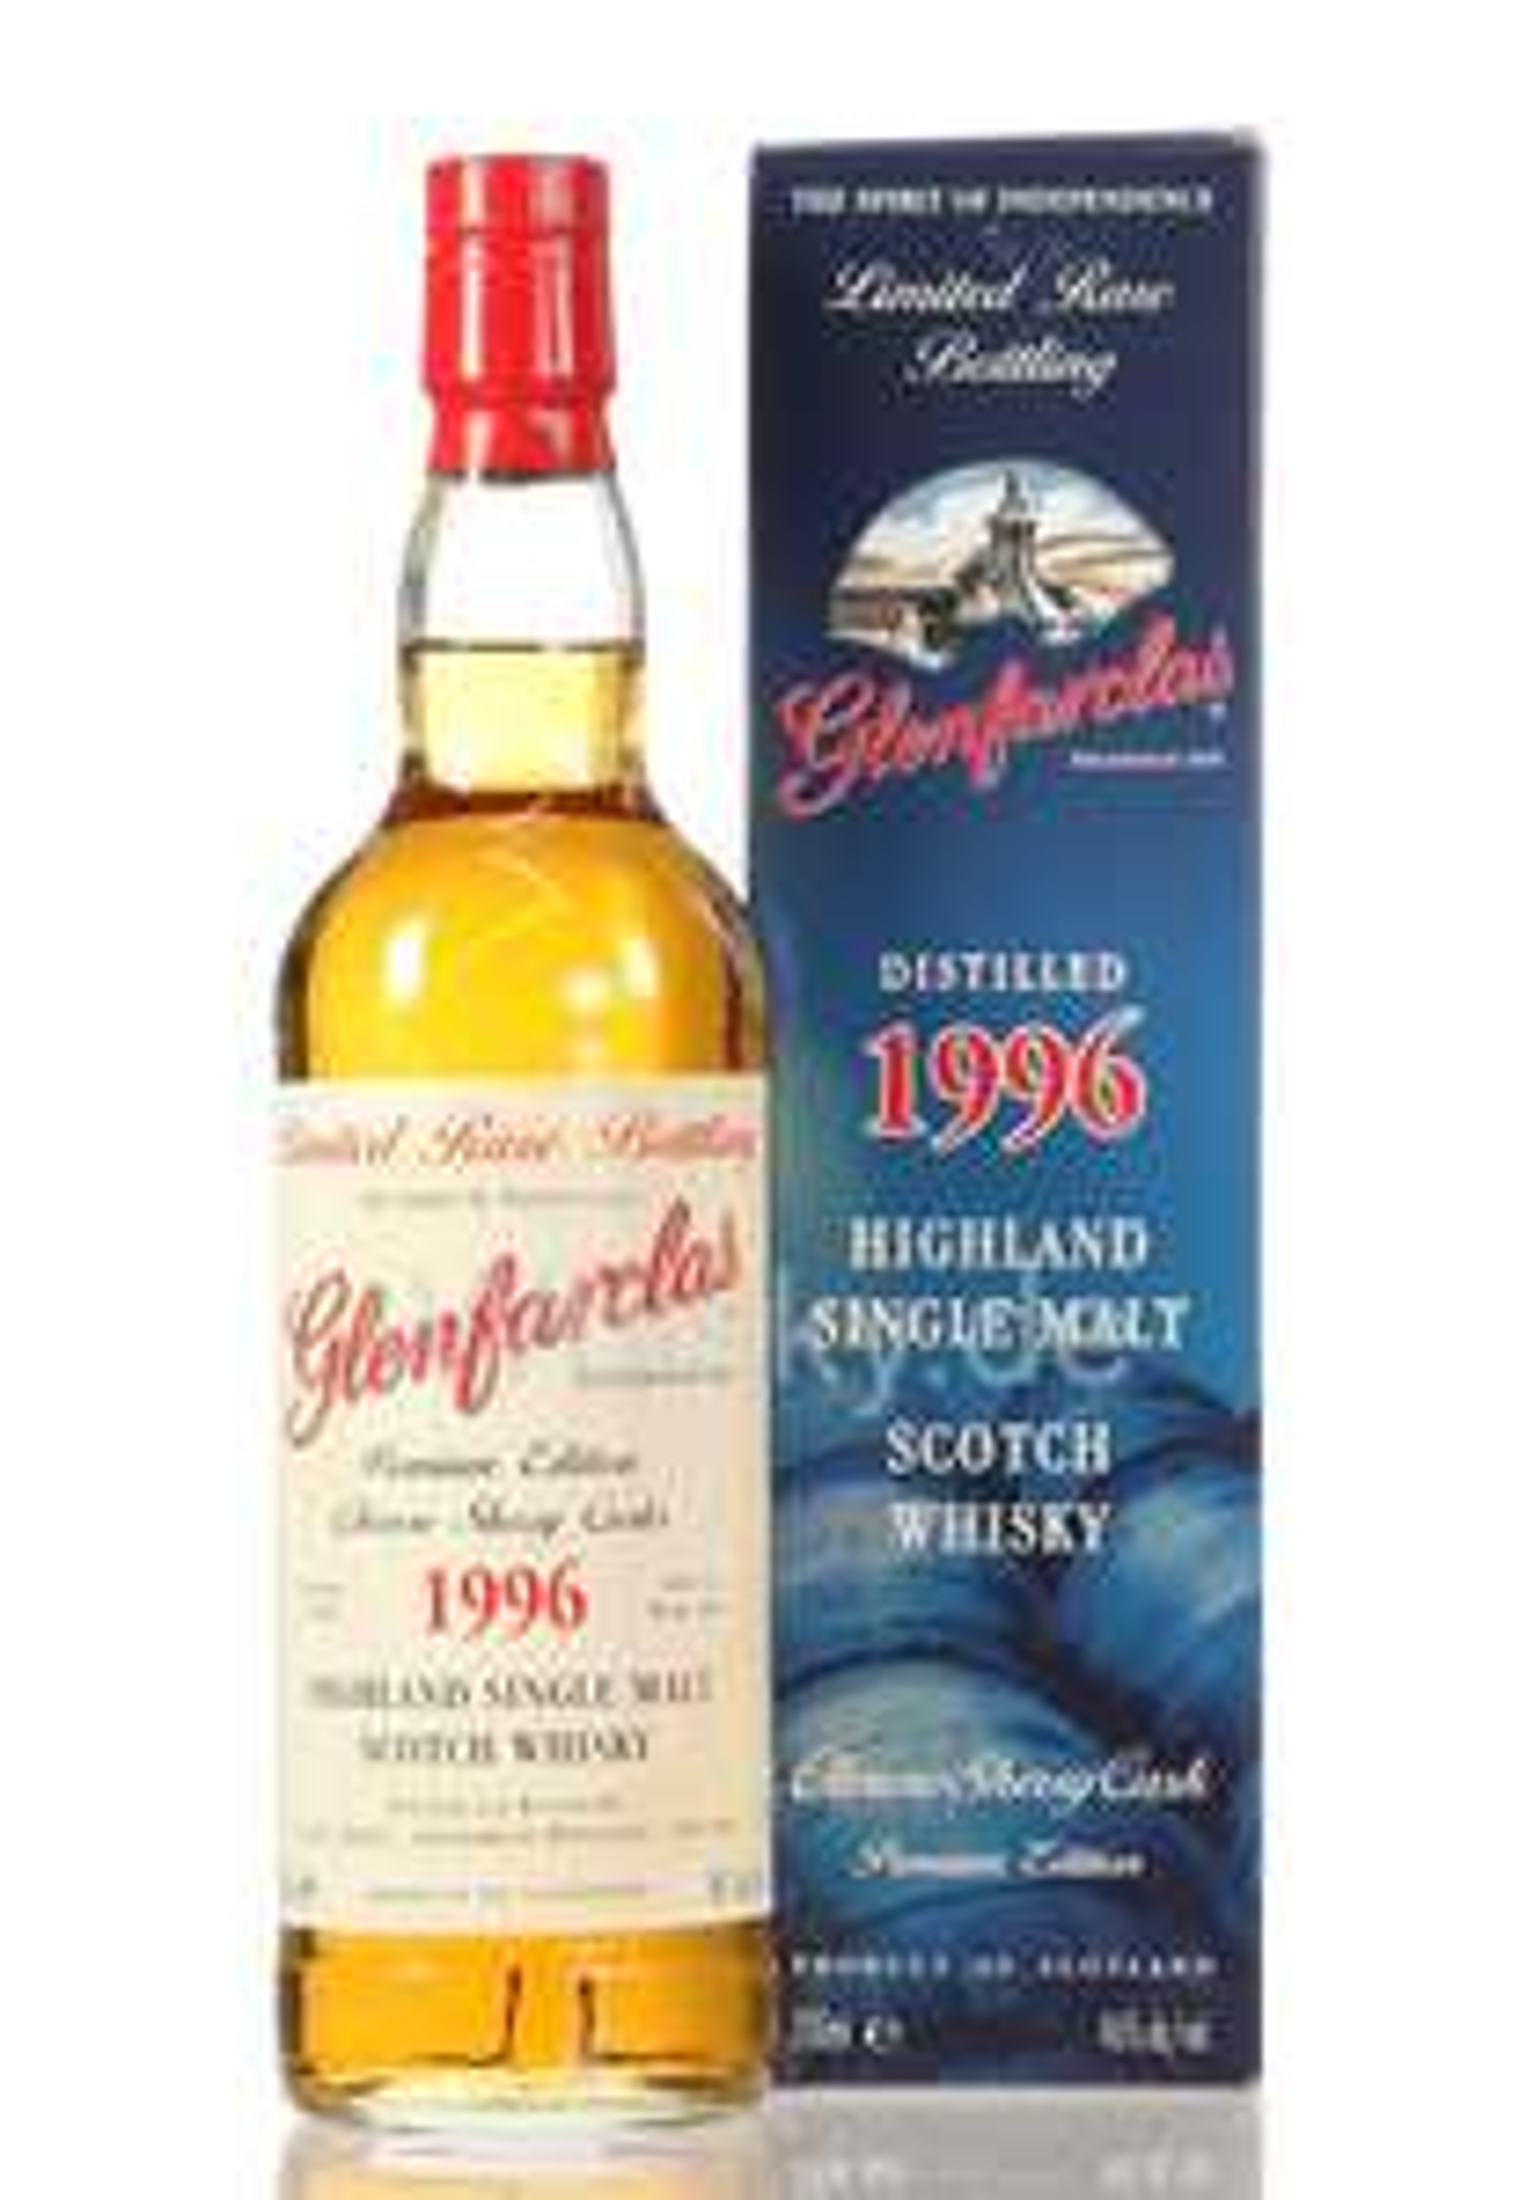 Glenfarclas Vintage 1996 Oloroso Sherry Casks 20 Jahre alter Whisky